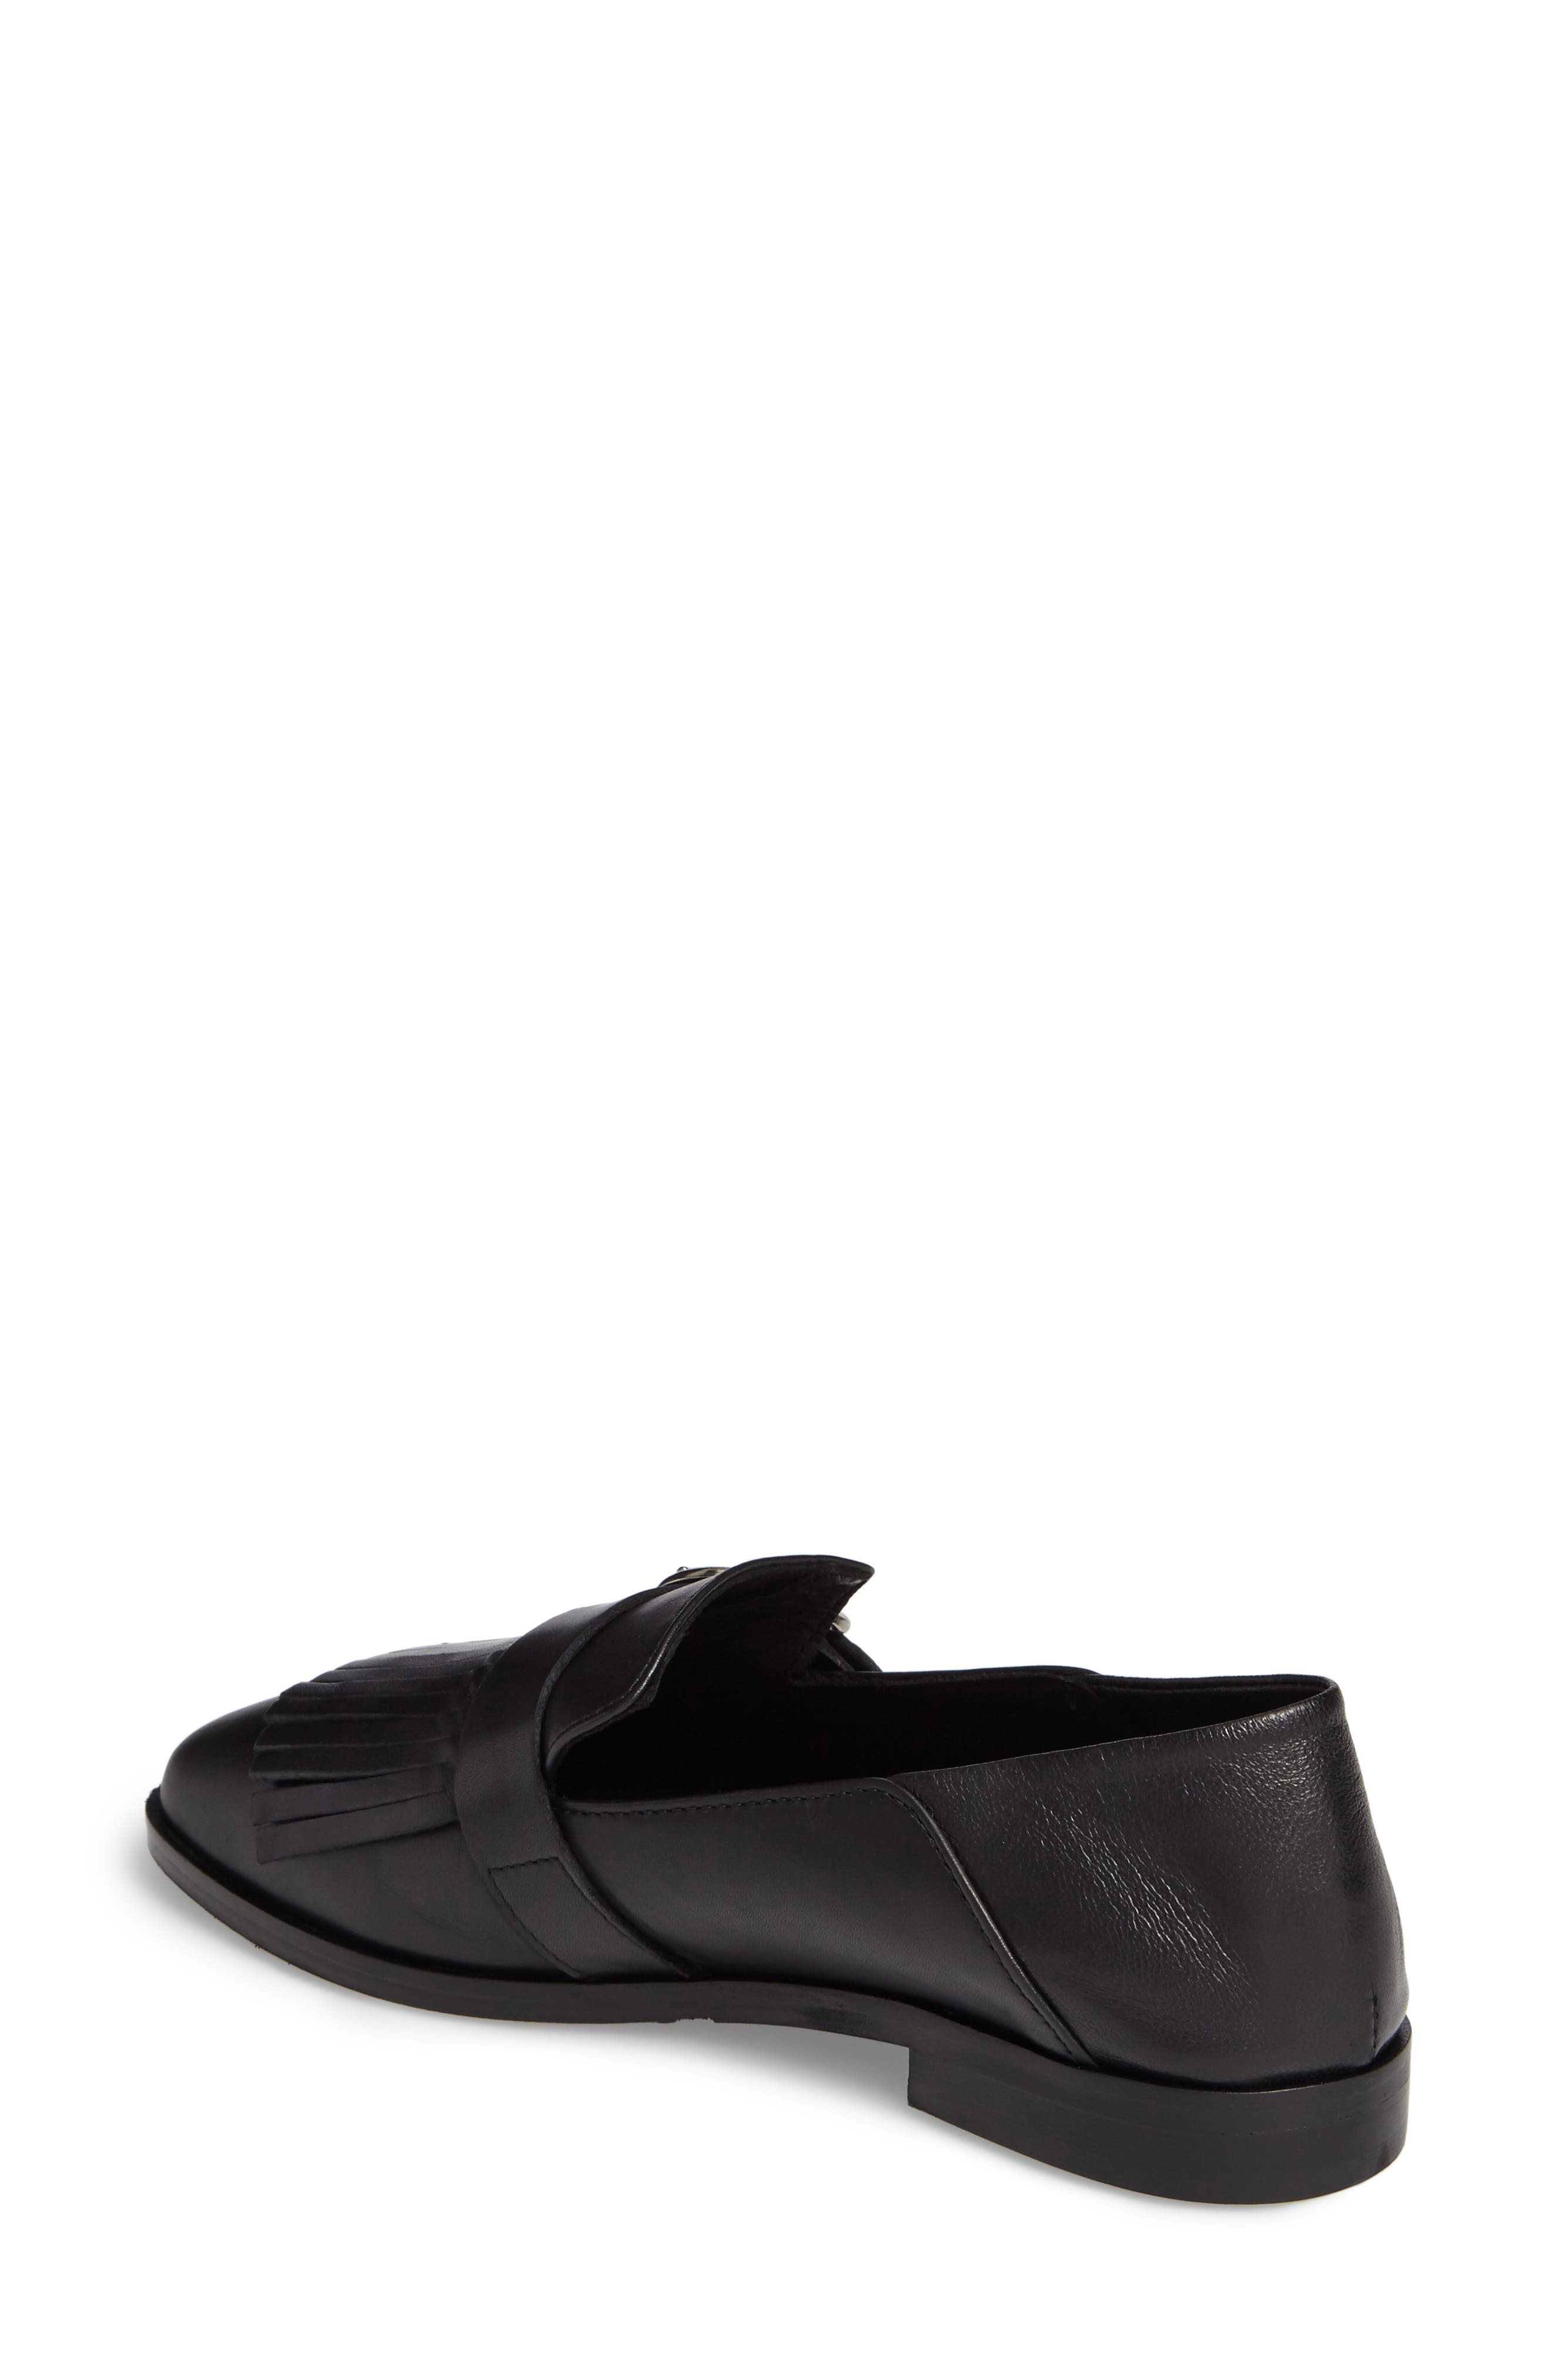 Dame Fringed Loafer Flat,                             Alternate thumbnail 2, color,                             001